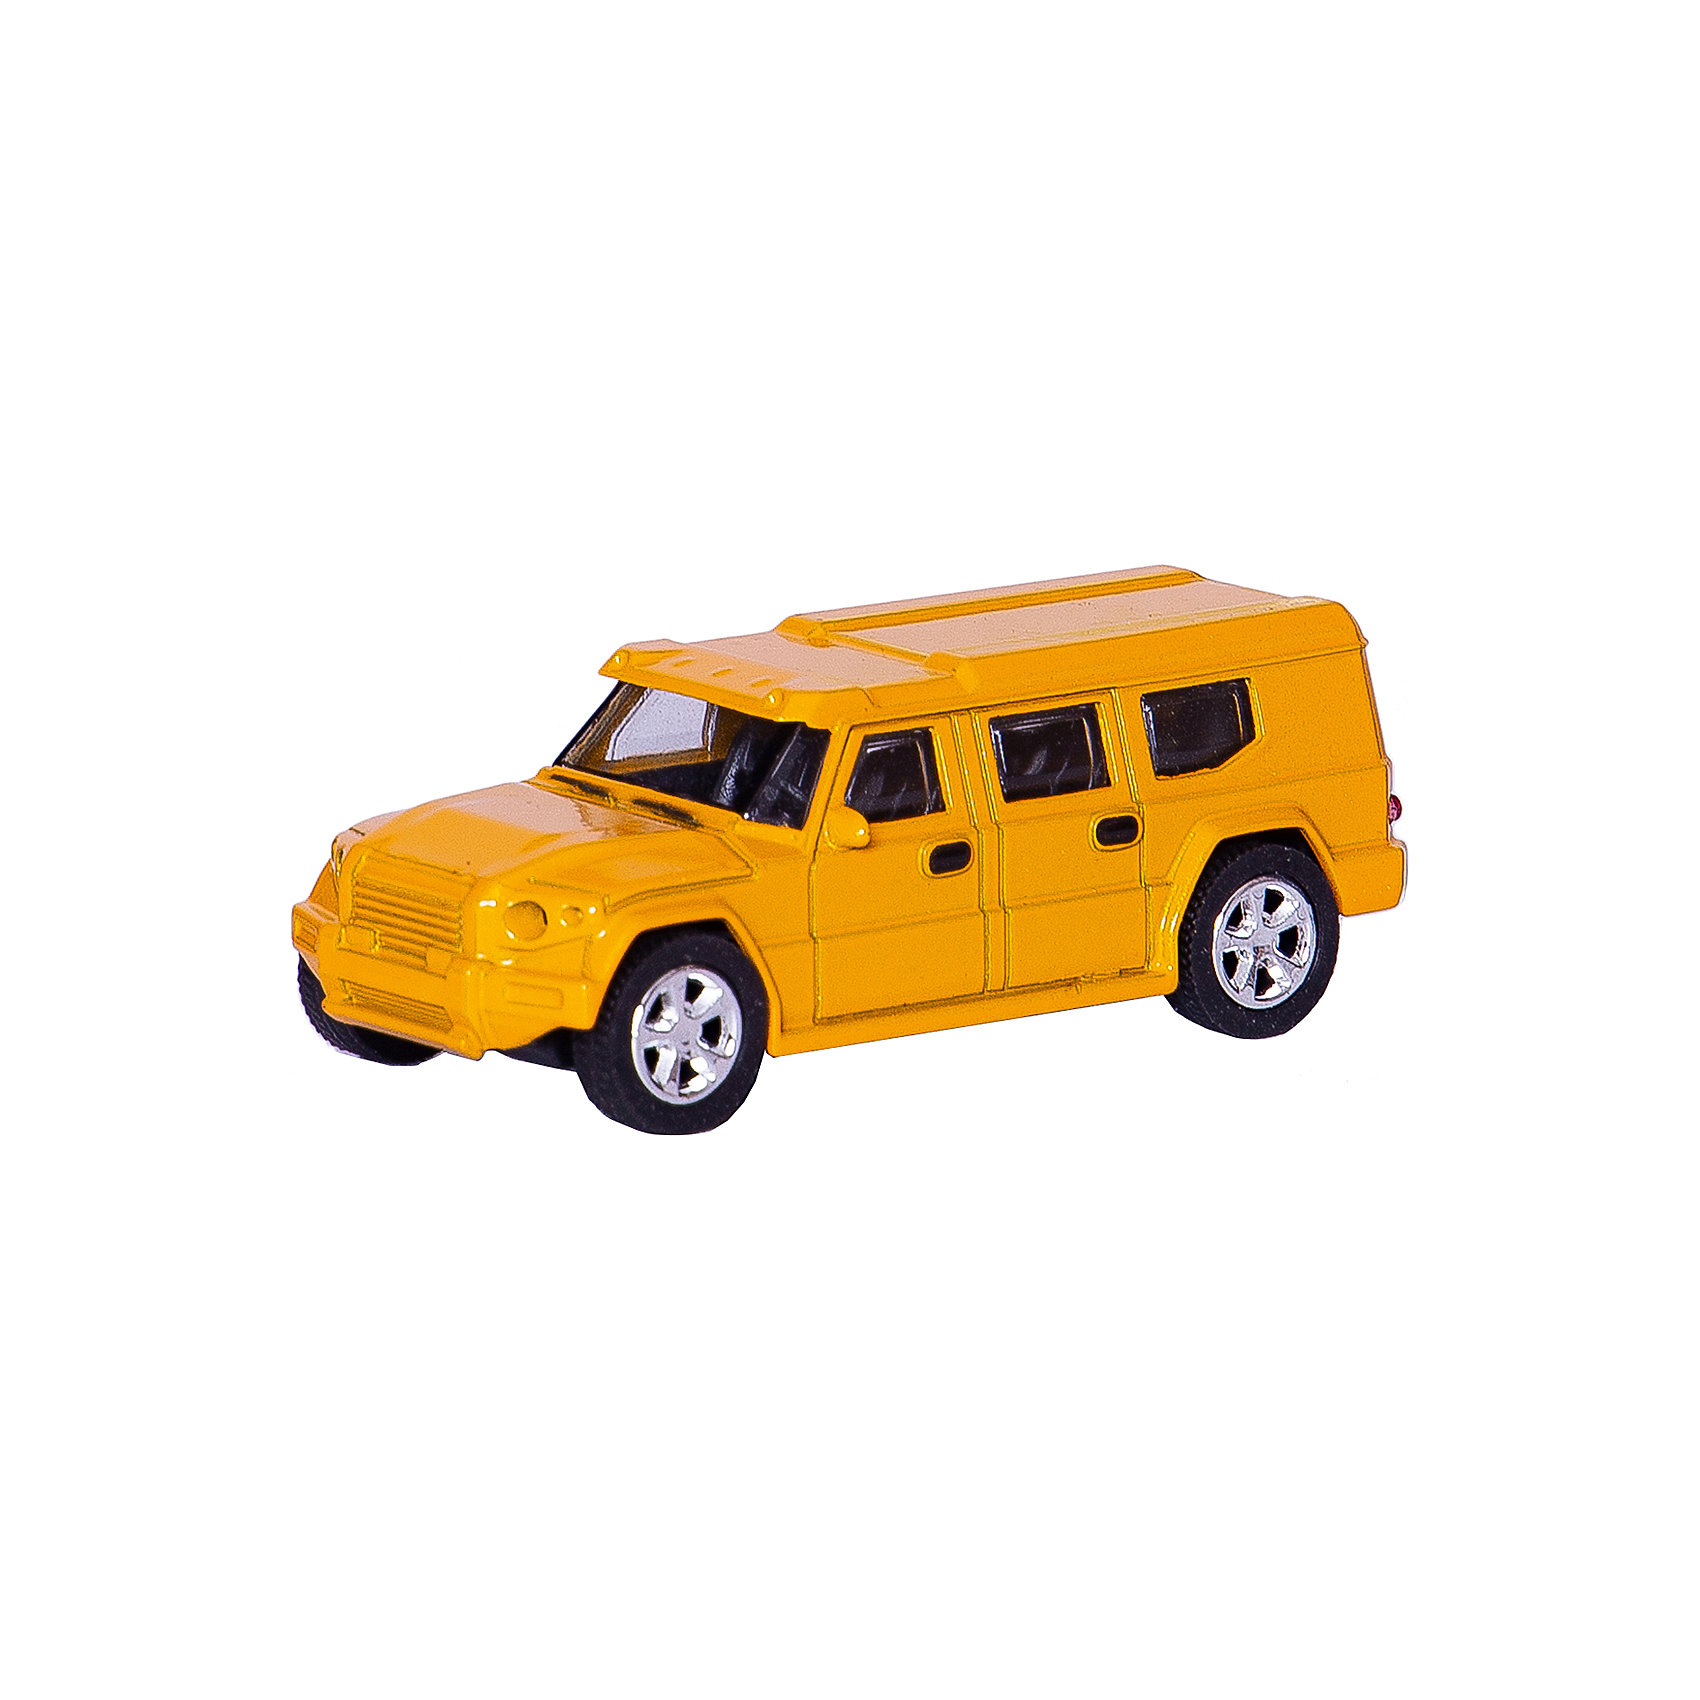 Машинка European Armored Car со светом фар 1:43, AutotimeМашинки<br><br><br>Ширина мм: 165<br>Глубина мм: 57<br>Высота мм: 75<br>Вес г: 13<br>Возраст от месяцев: 36<br>Возраст до месяцев: 2147483647<br>Пол: Мужской<br>Возраст: Детский<br>SKU: 5584032